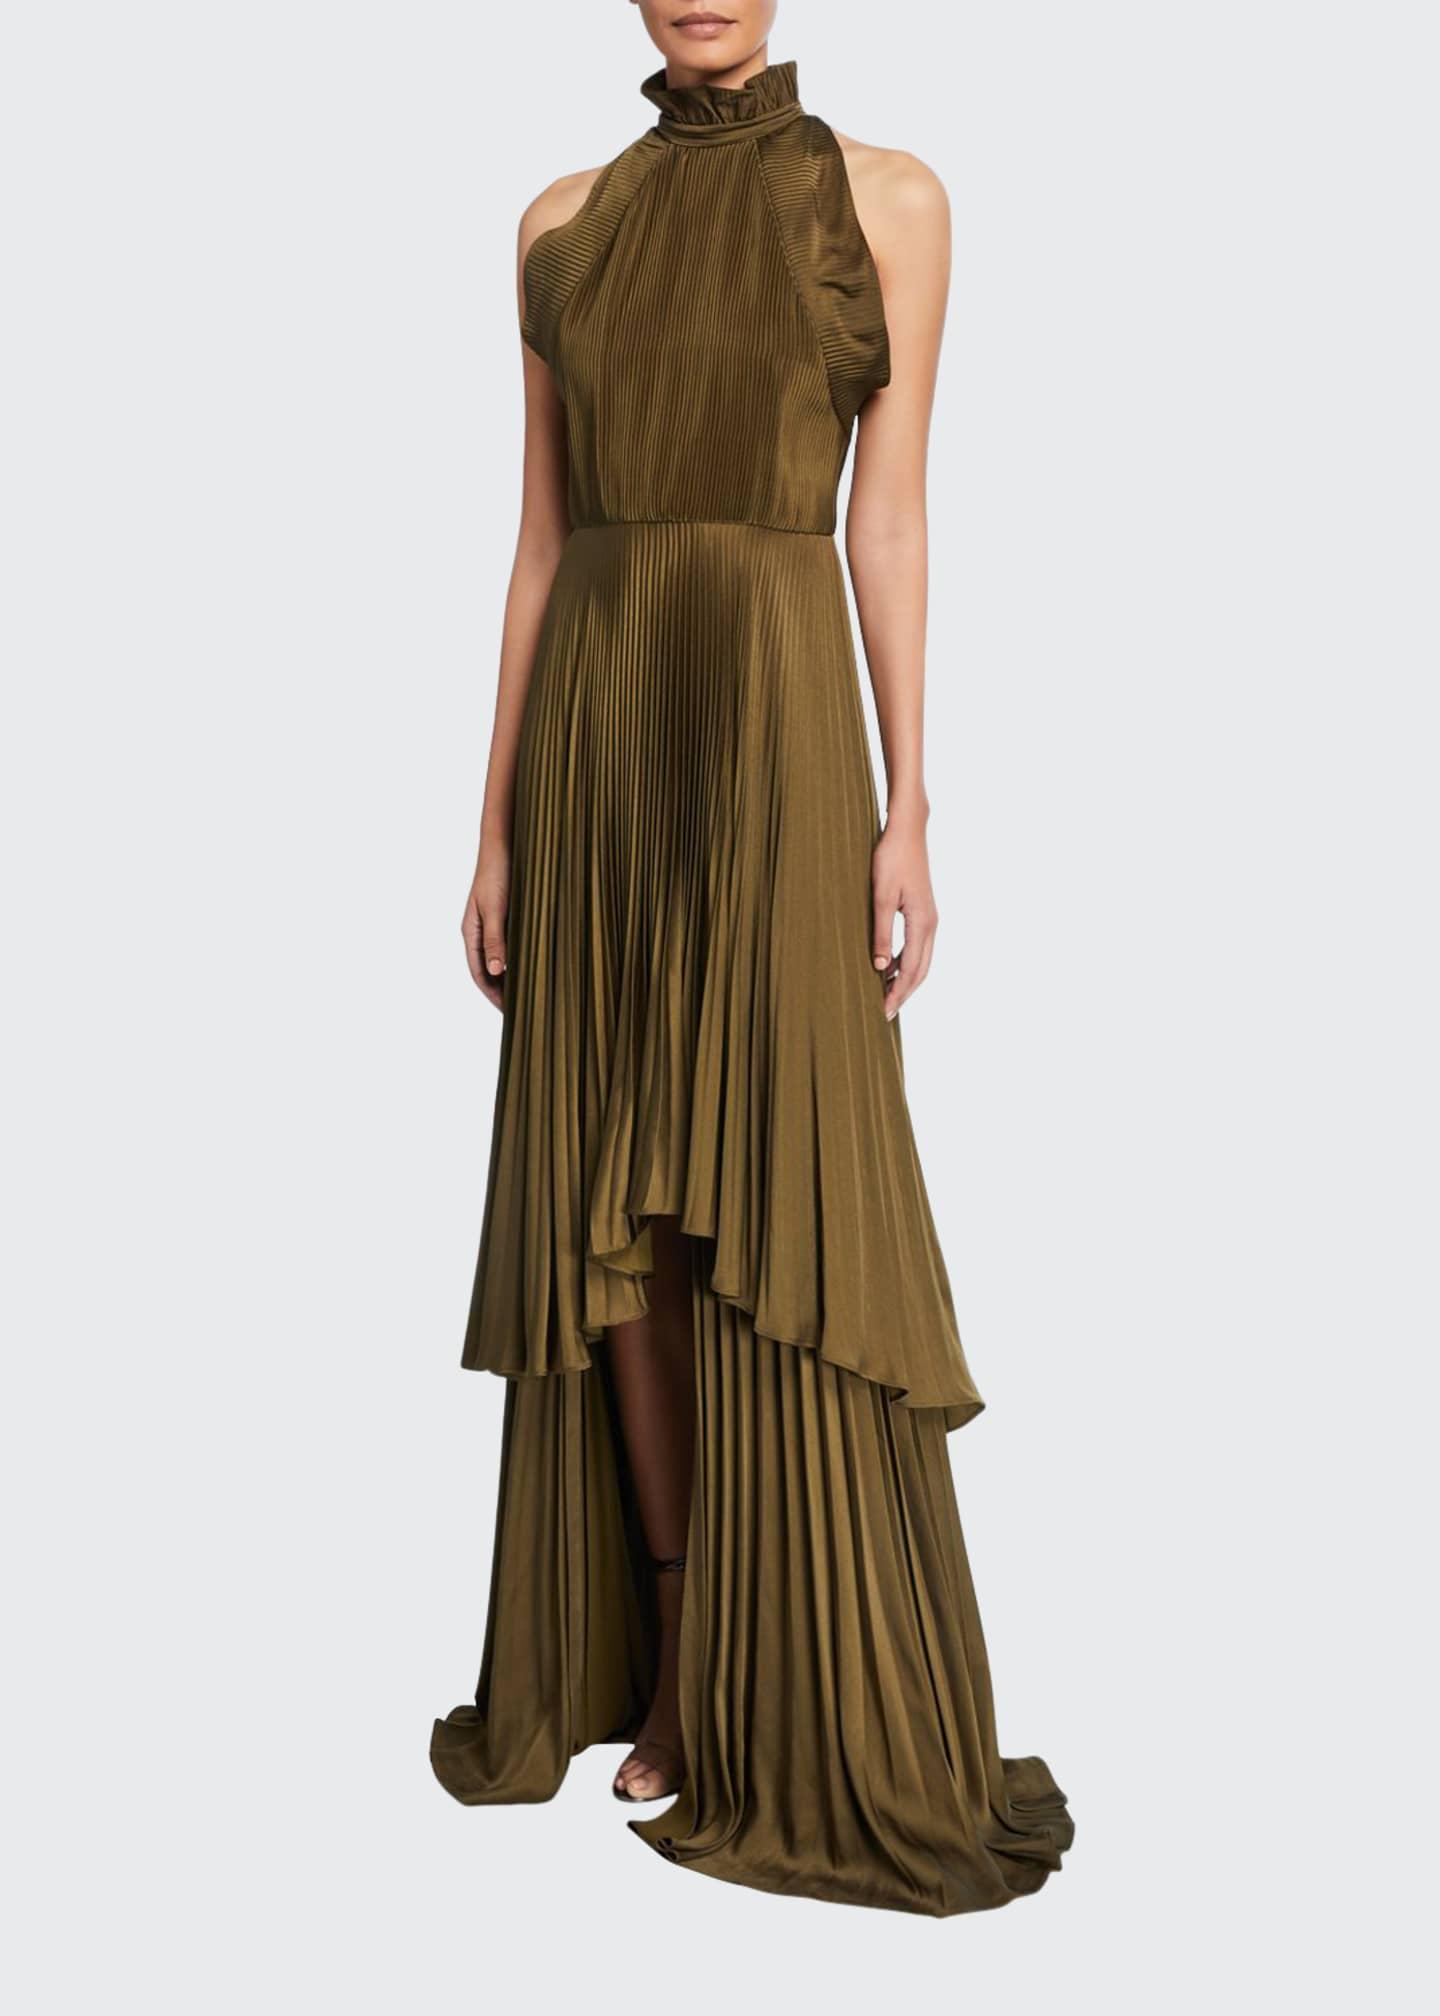 flor et.al Tiffany Pleated Charmeuse High-Neck Sleeveless Gown